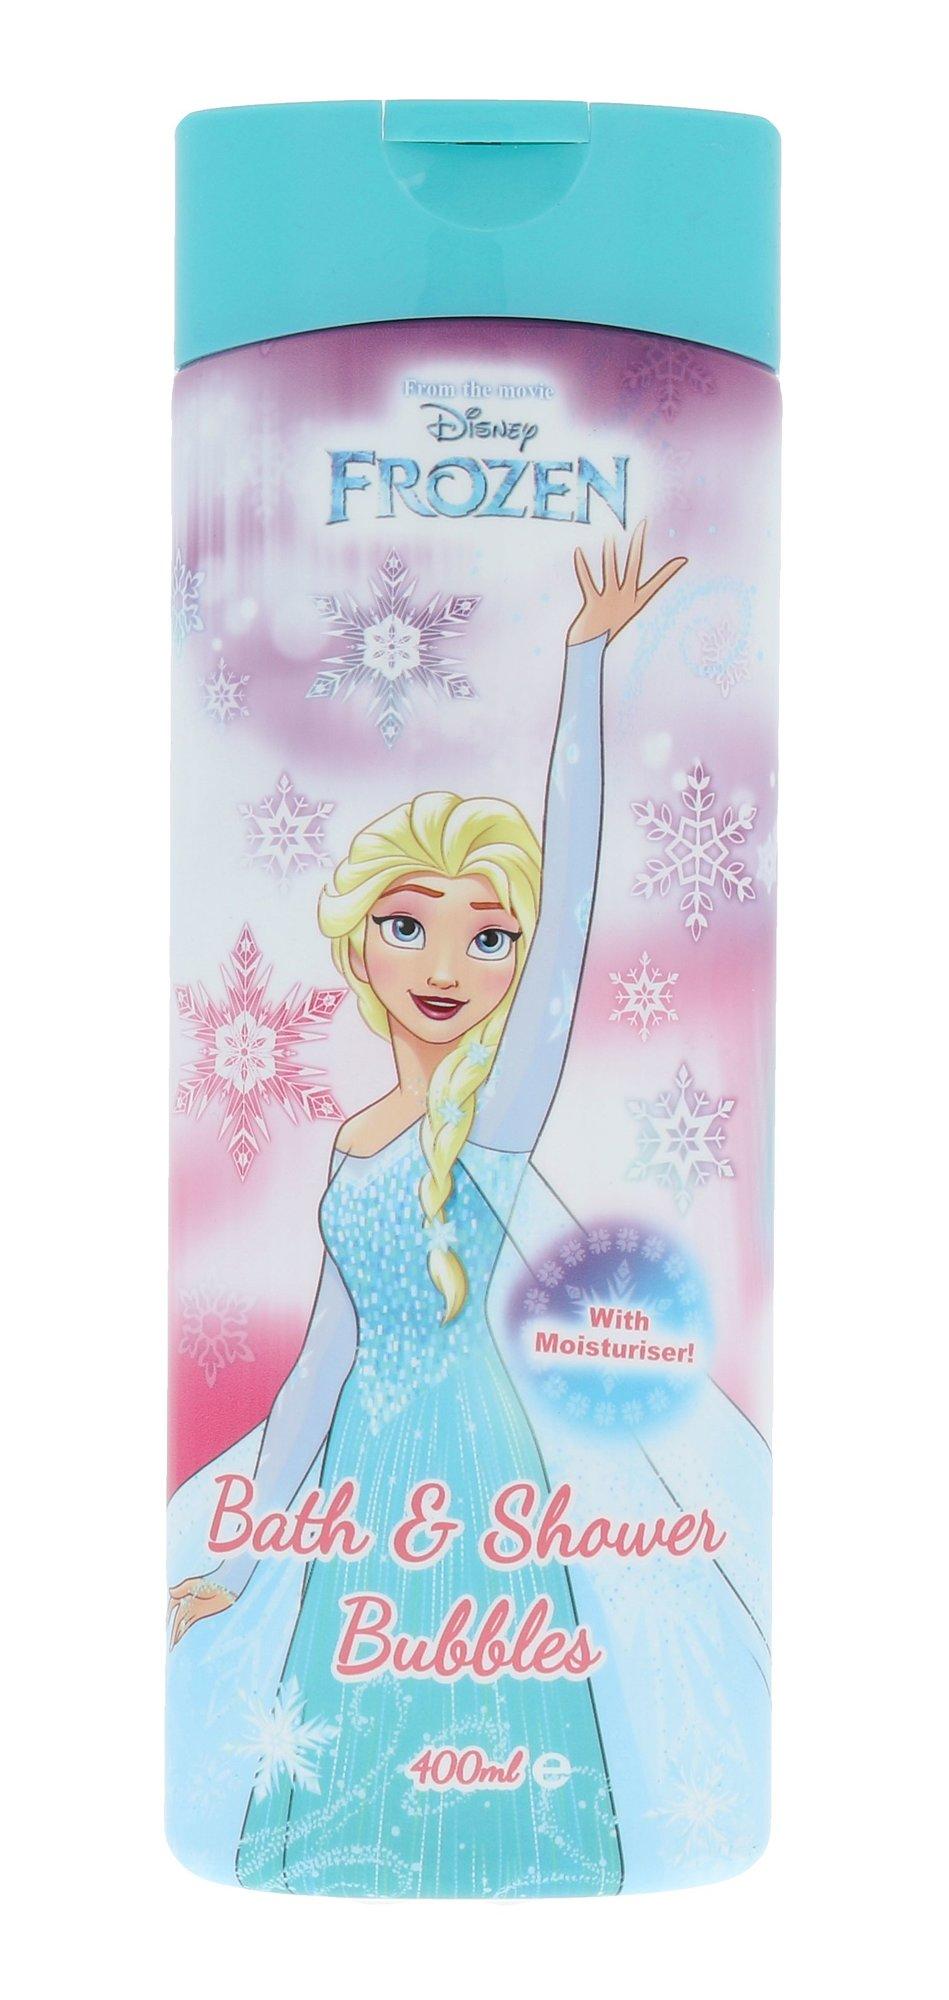 Disney Frozen Cosmetic 400ml